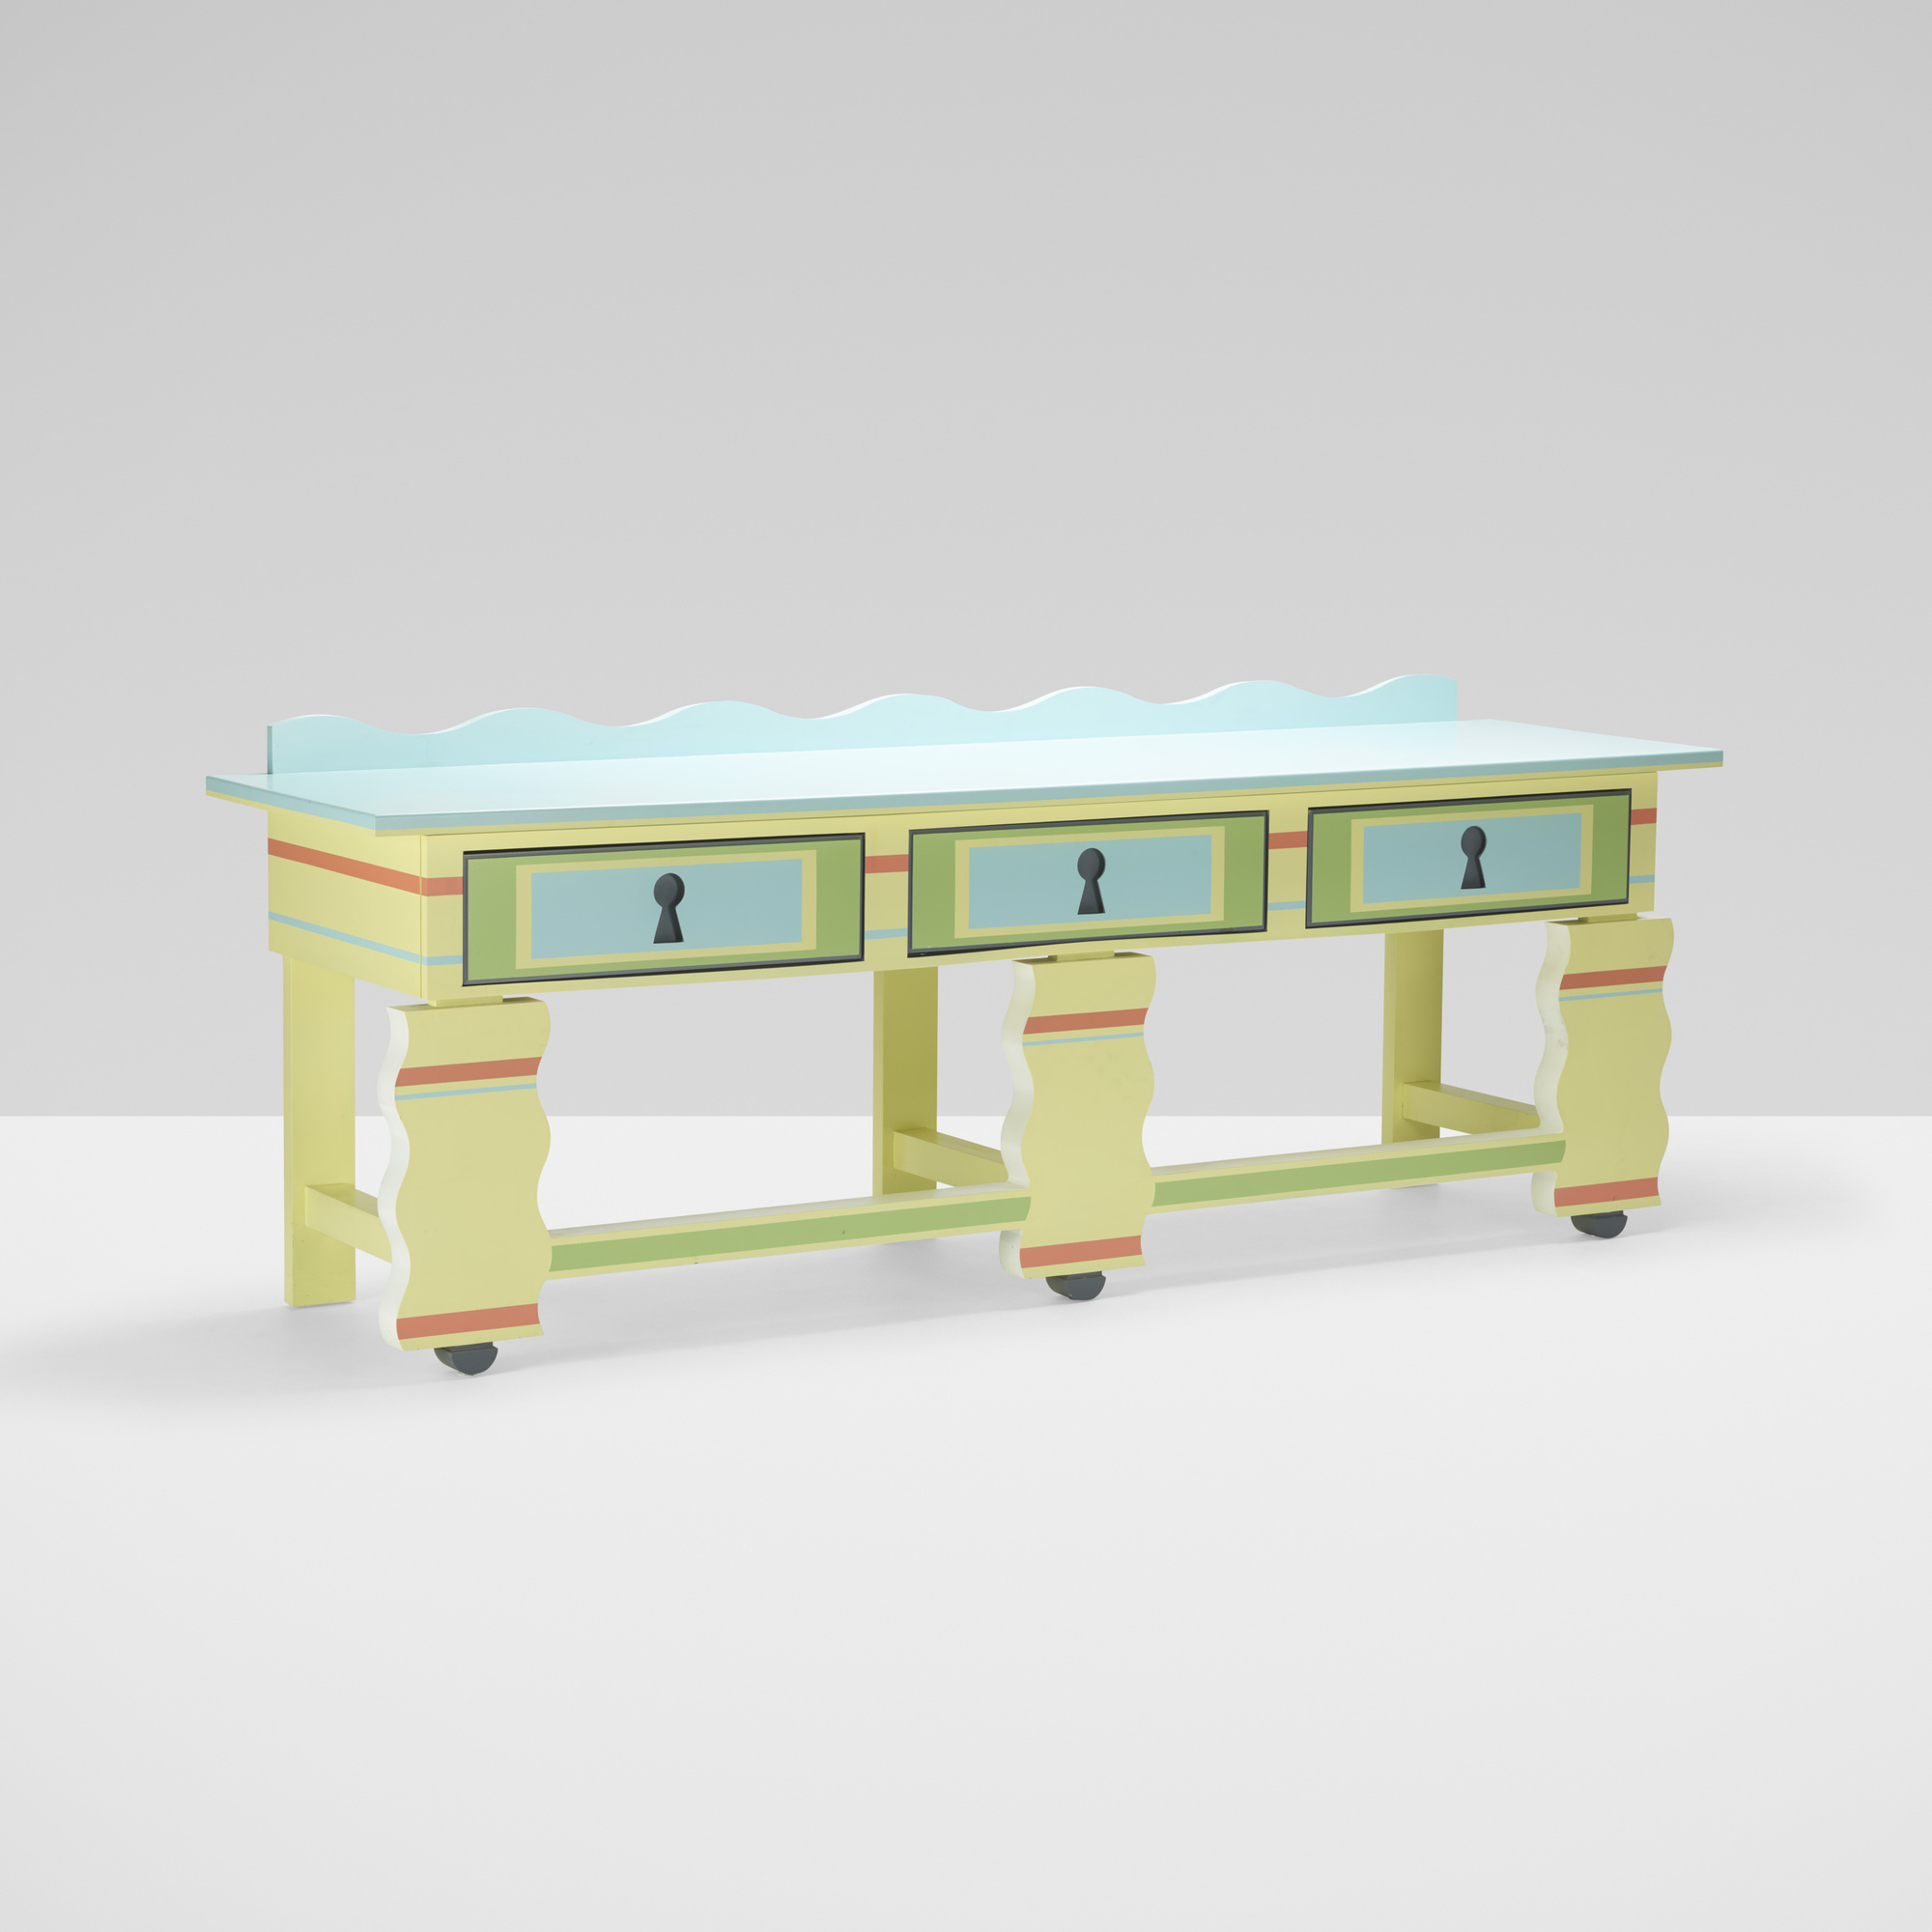 212: Robert Venturi with Denise Scott Brown / custom console (1 of 3)